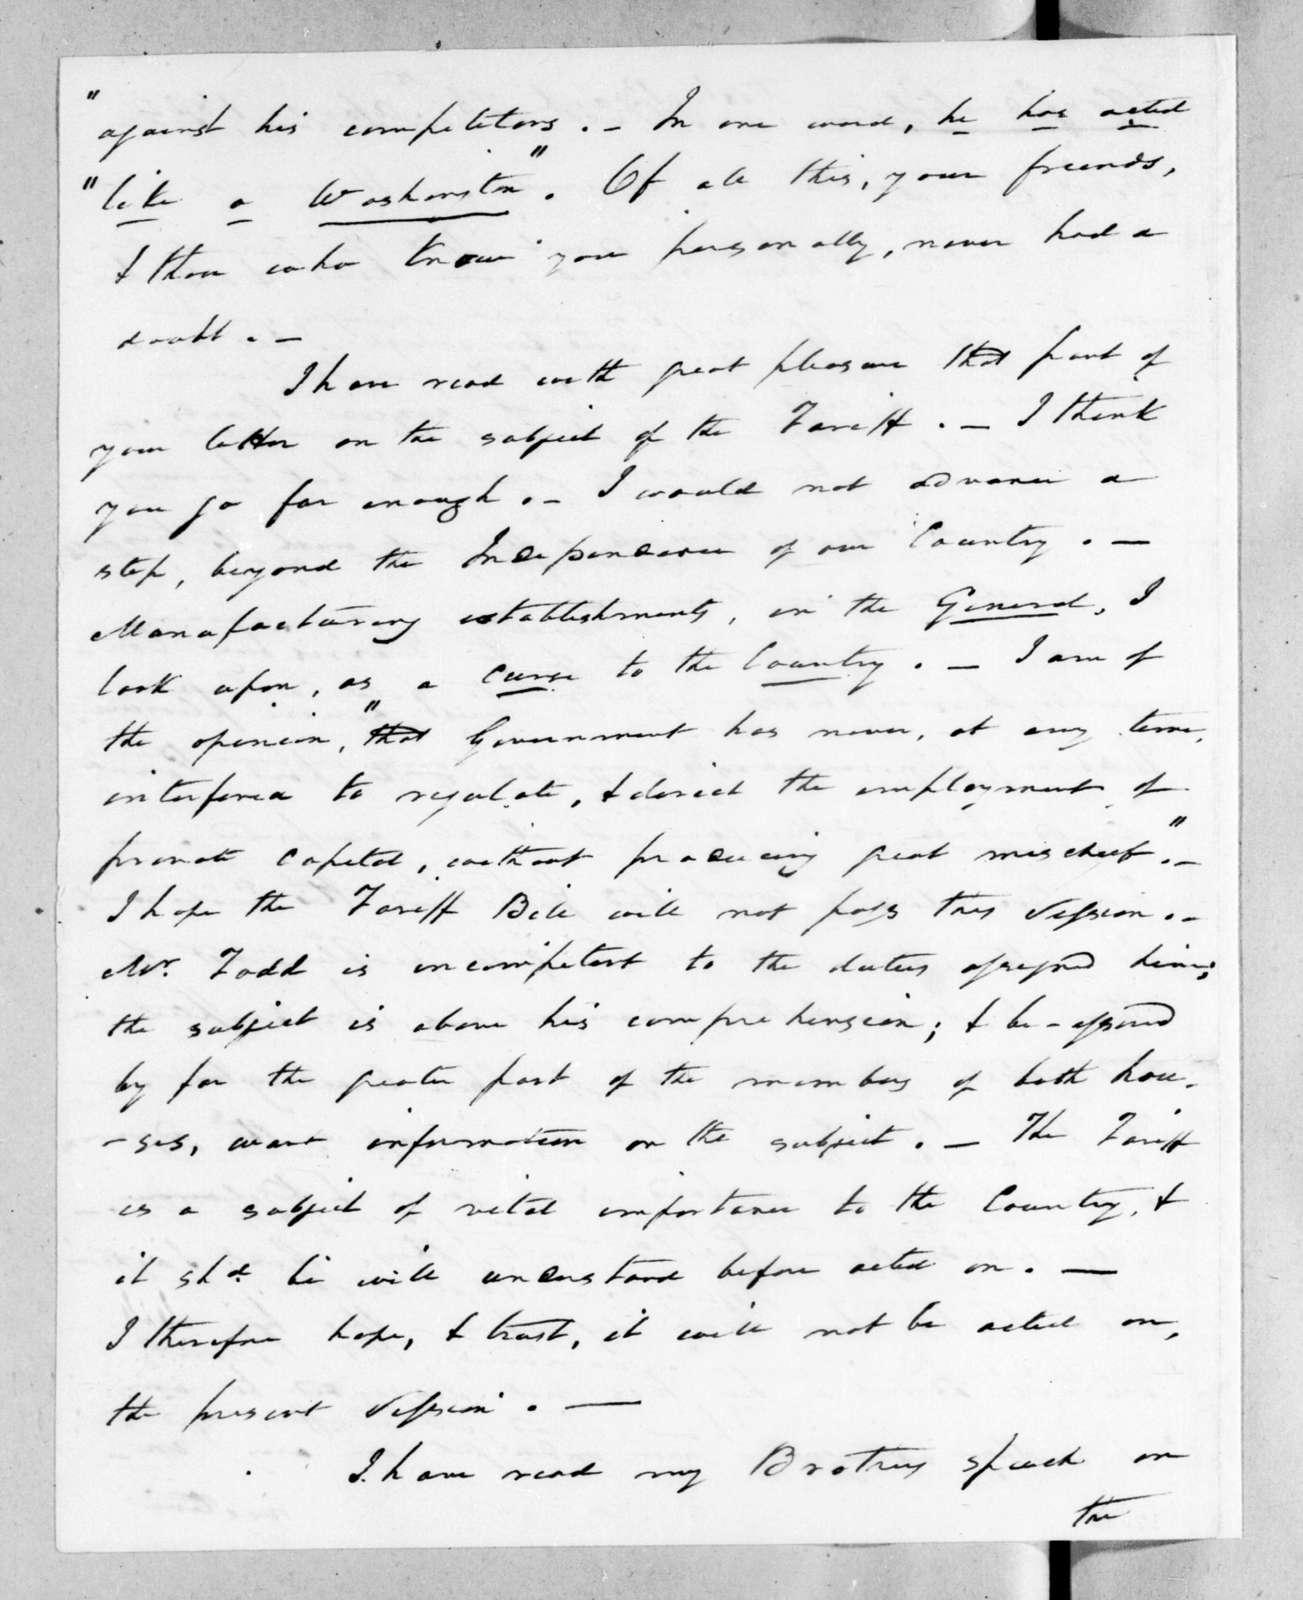 Arthur Peronneau Hayne to Andrew Jackson, April 16, 1824